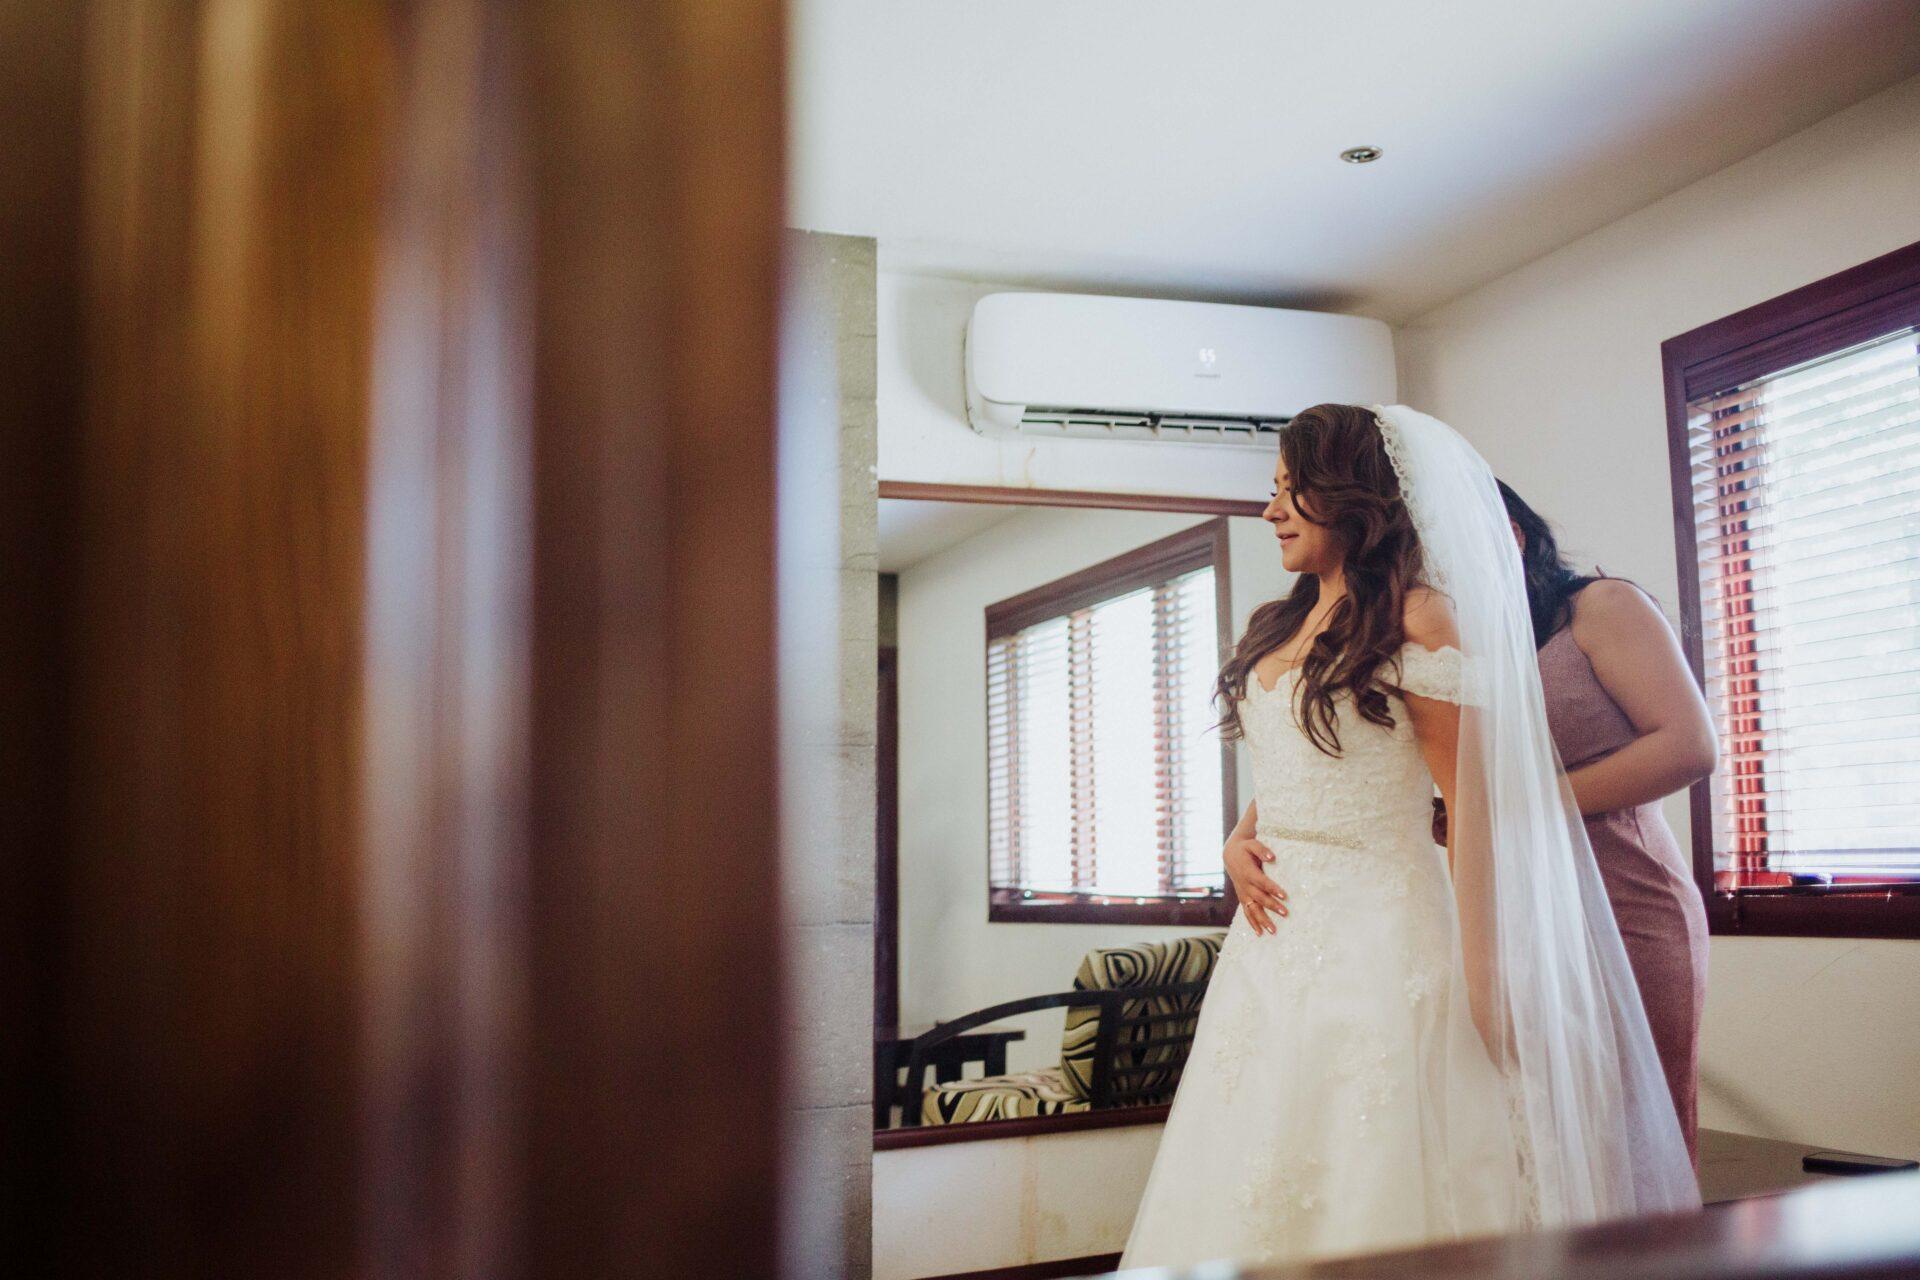 javier_noriega_fotografo_bodas_torreon_coahuila_zacatecas_wedding_photographer15a